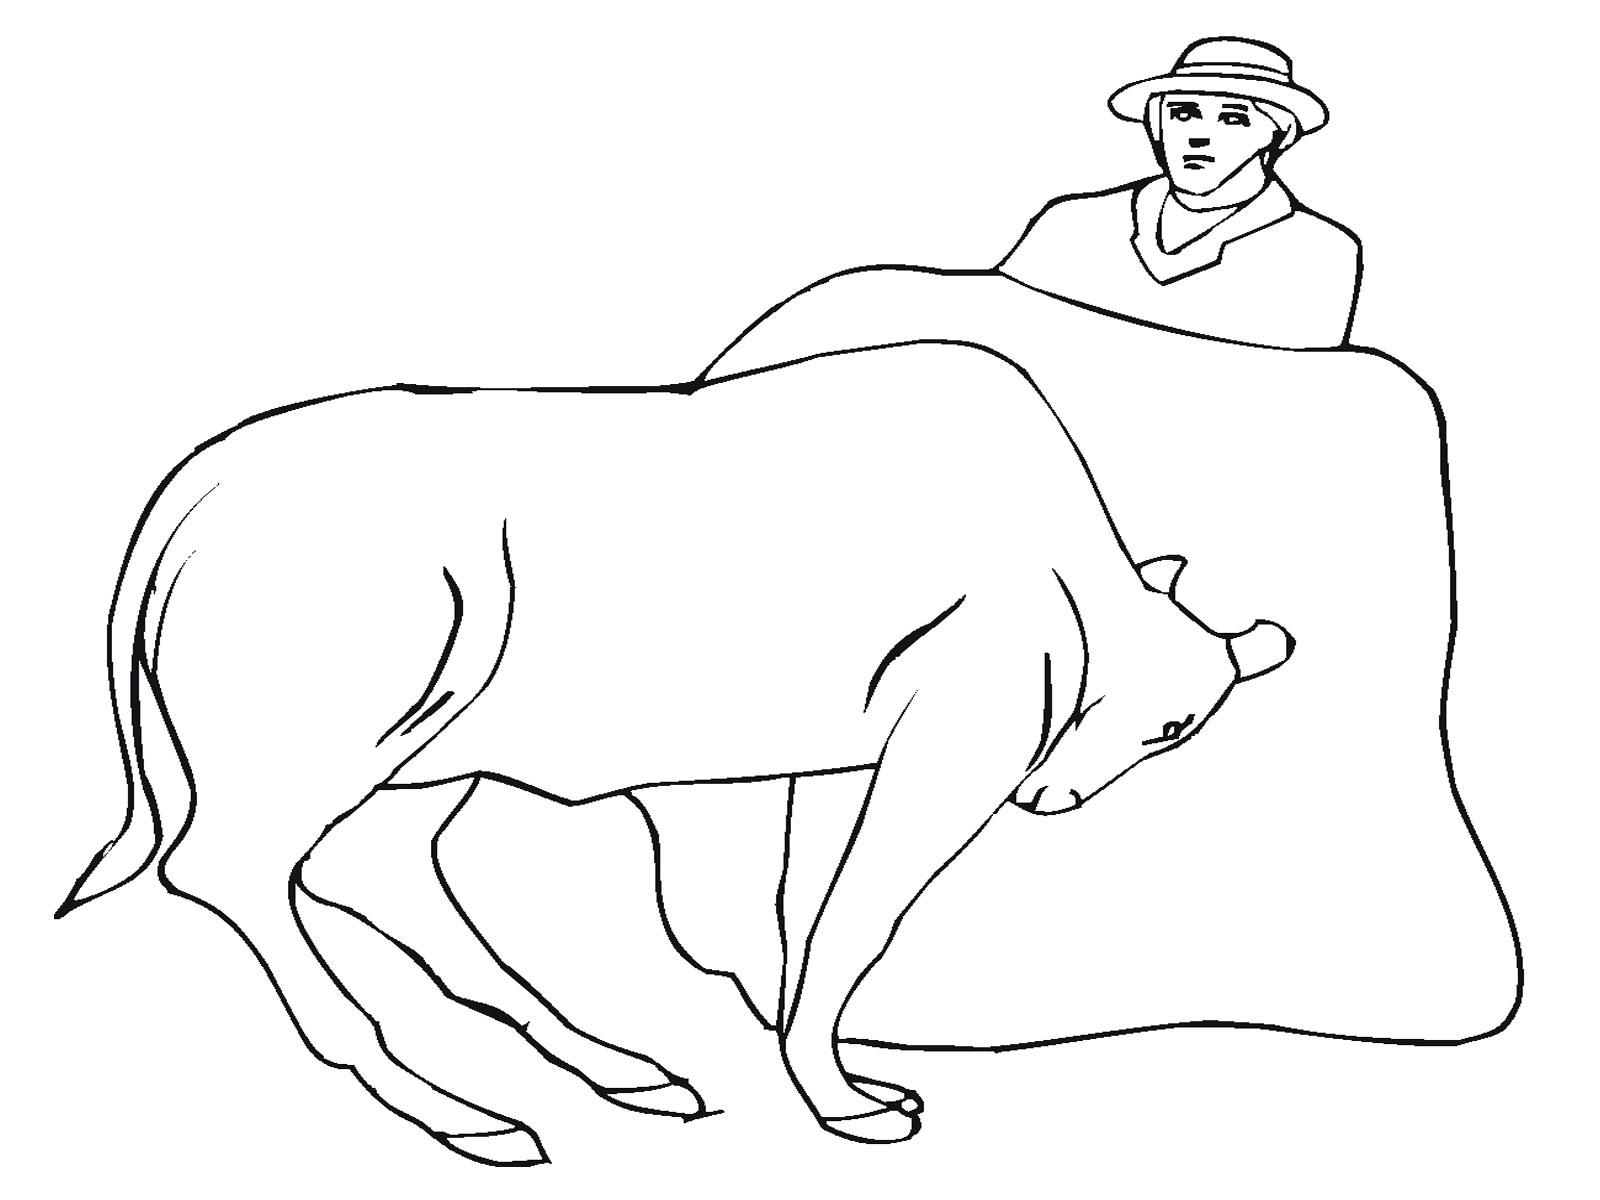 Matador With Bull Coloring Page